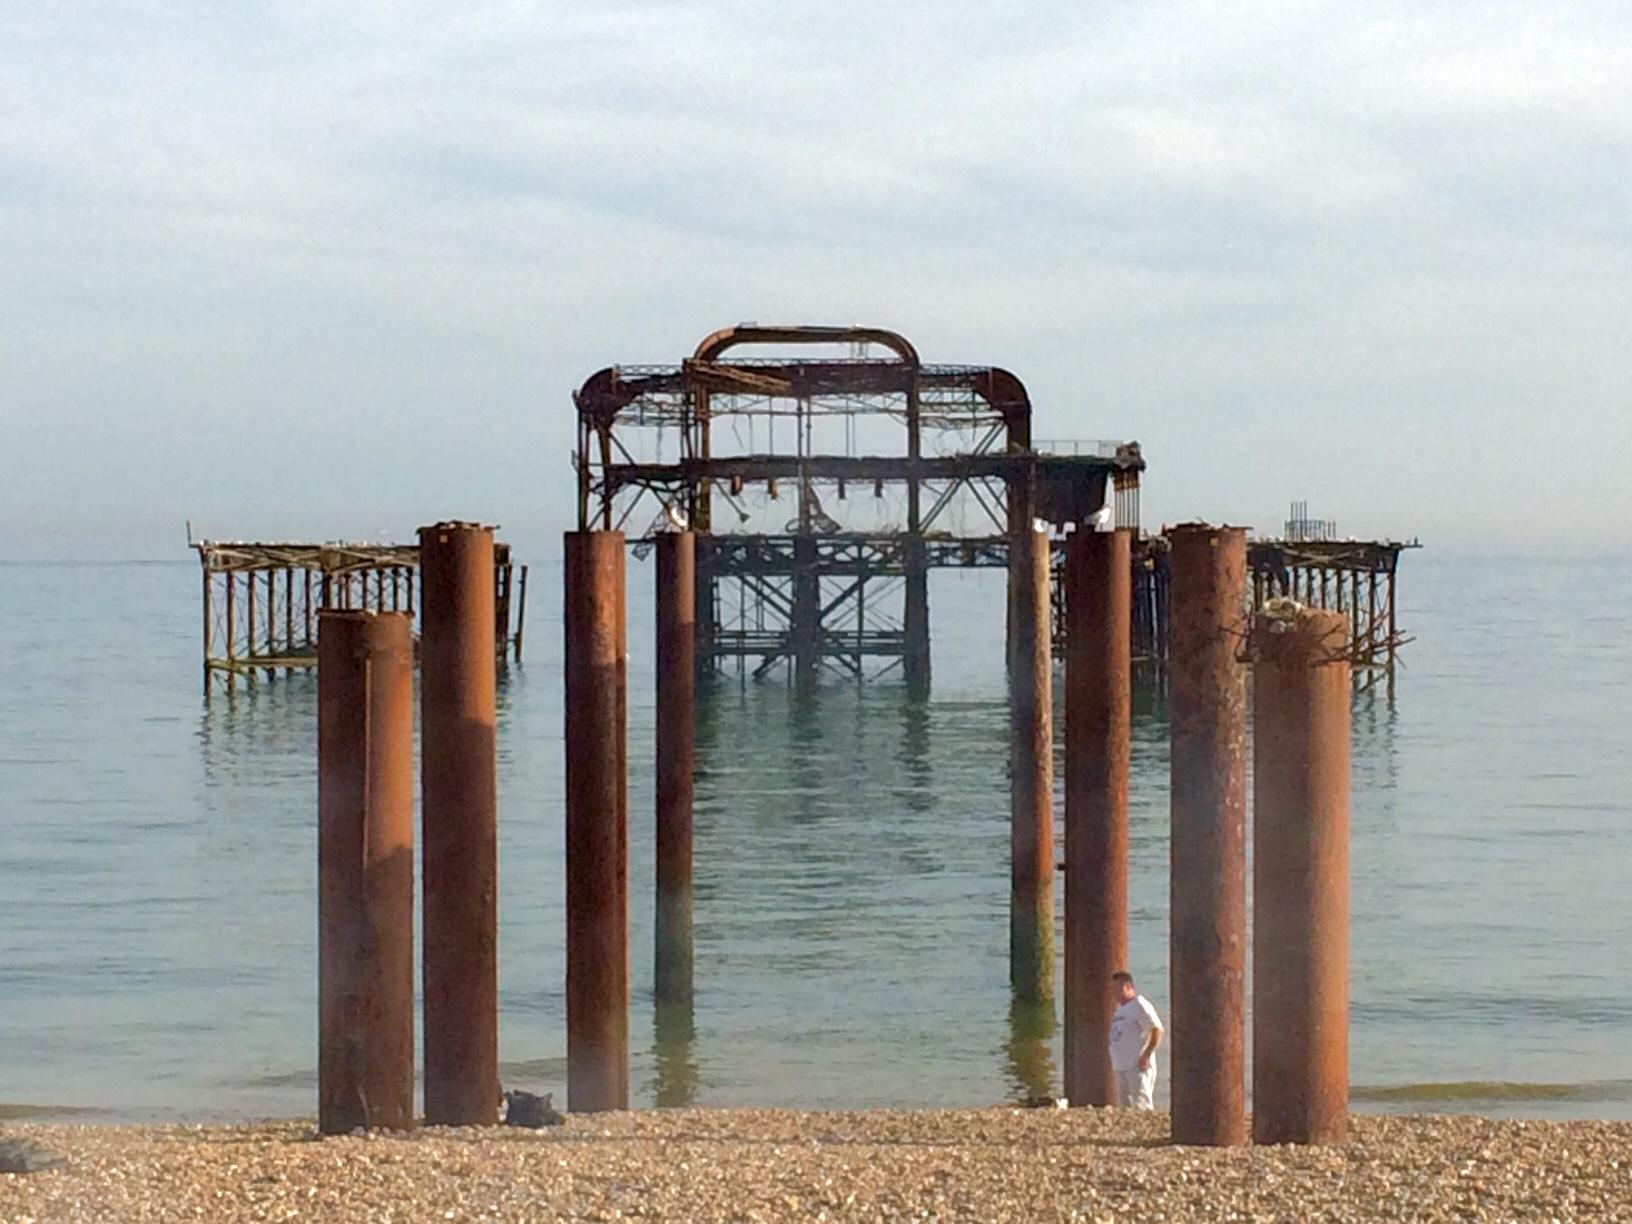 Brighton attraction the old pier